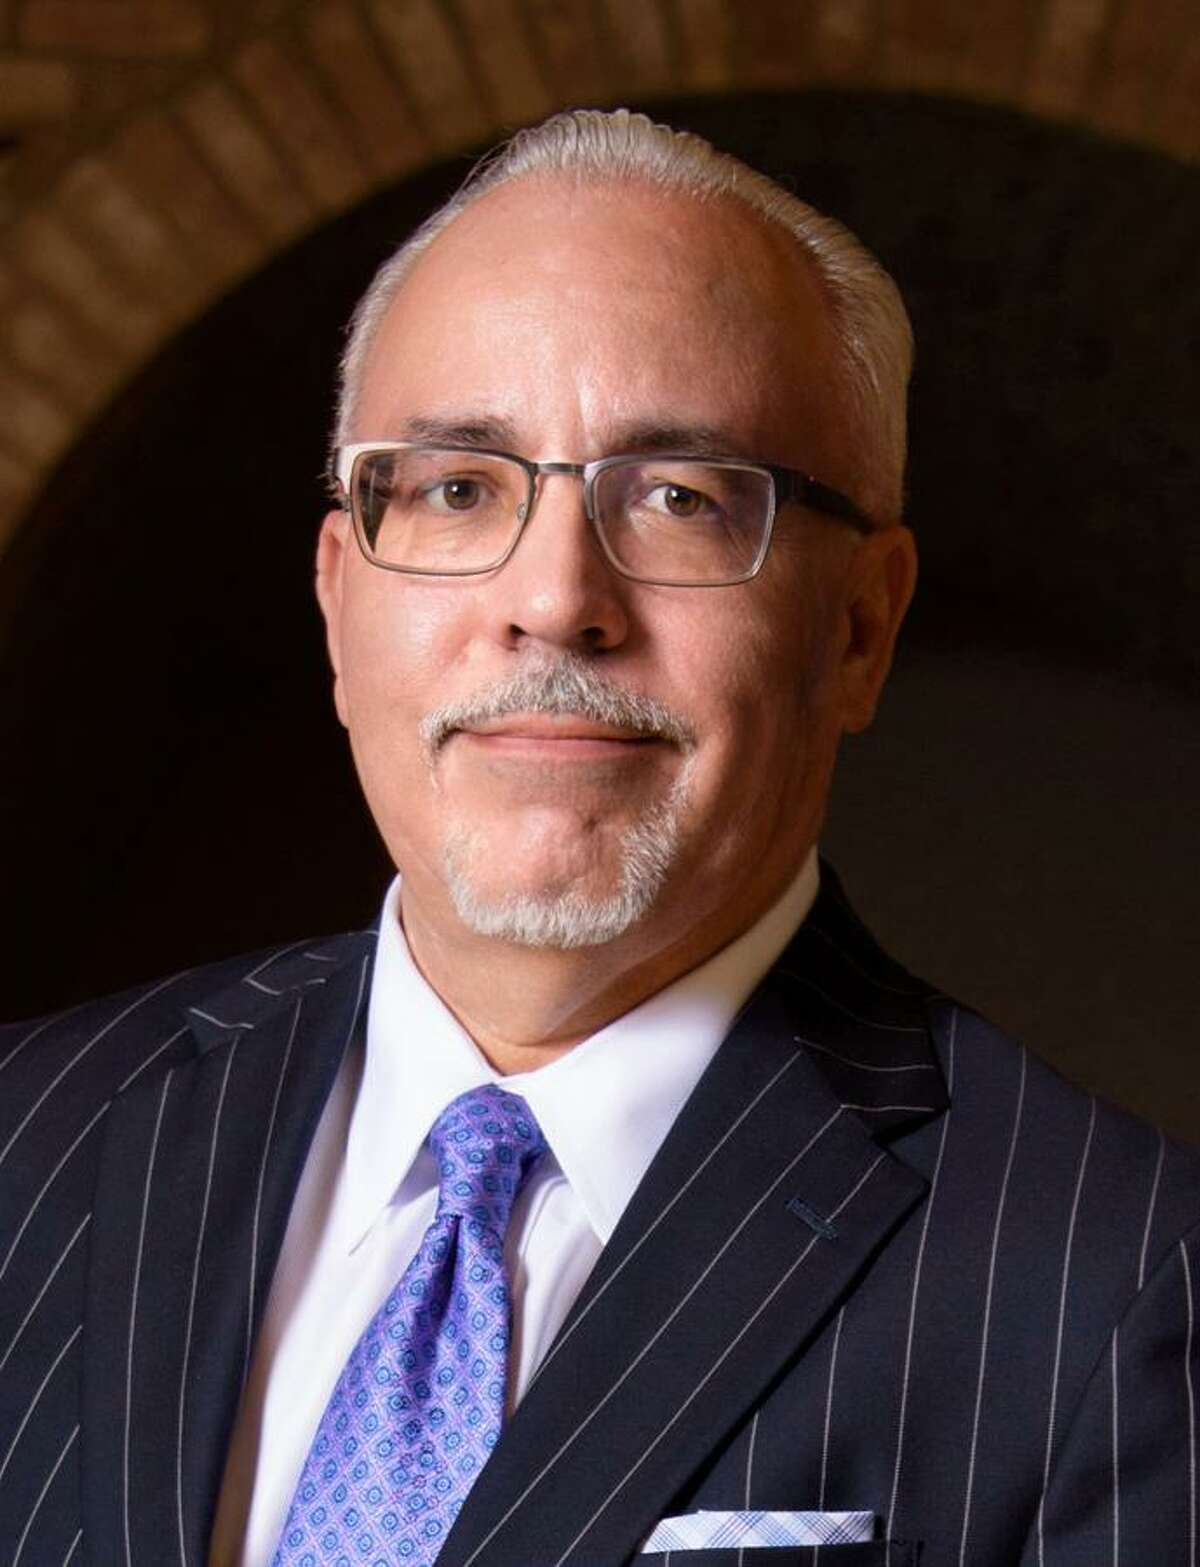 Benny Agosto Jr. has been elected to serveas 2019-2020 Houston Bar Association president.